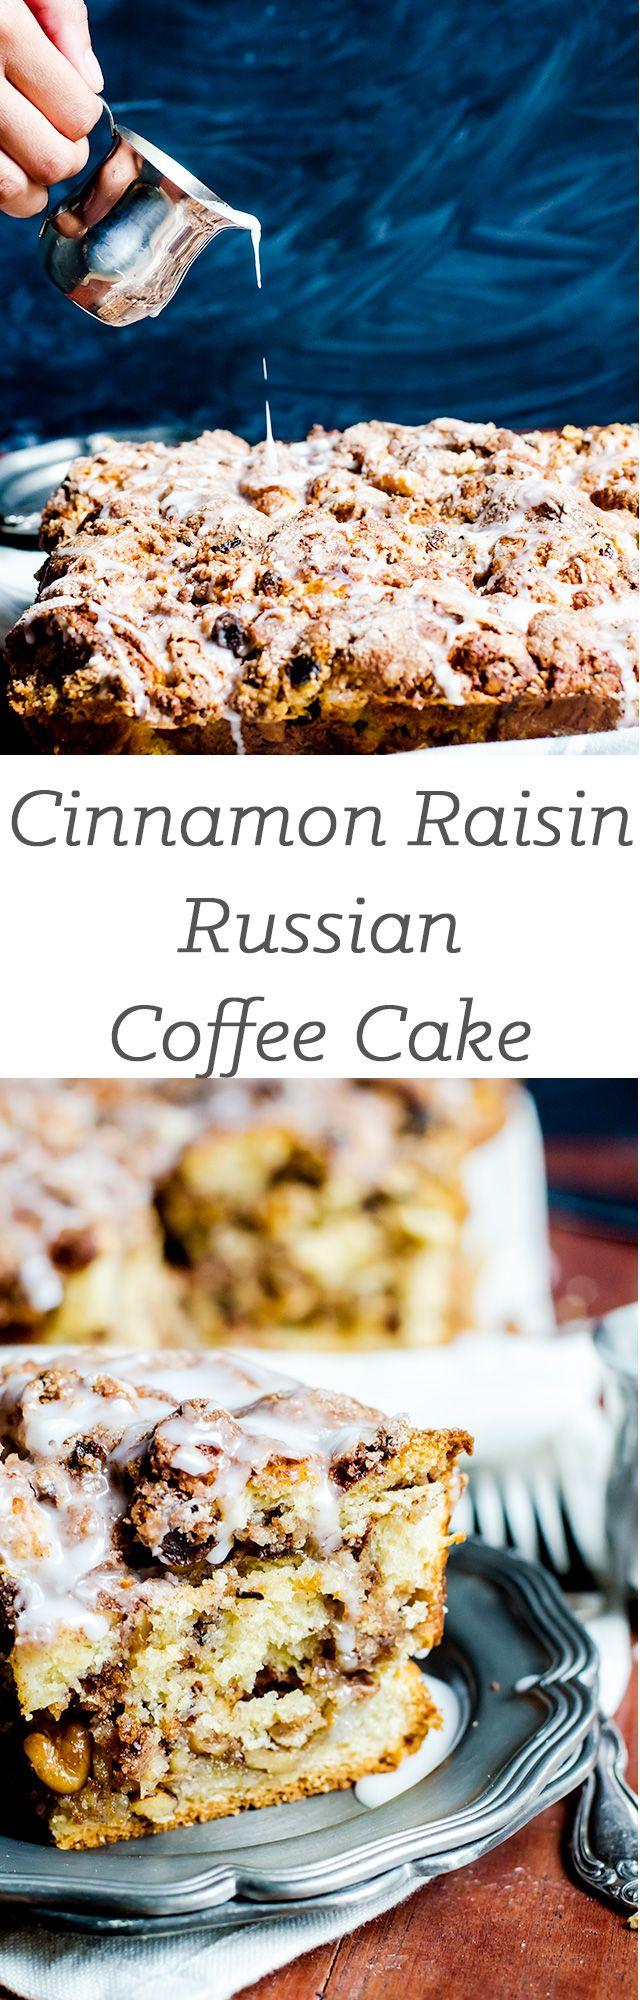 Cinnamon Raisin Russian Coffee Cake + Jewish Baker's Pastry Secret Review | cookienameddesire.com